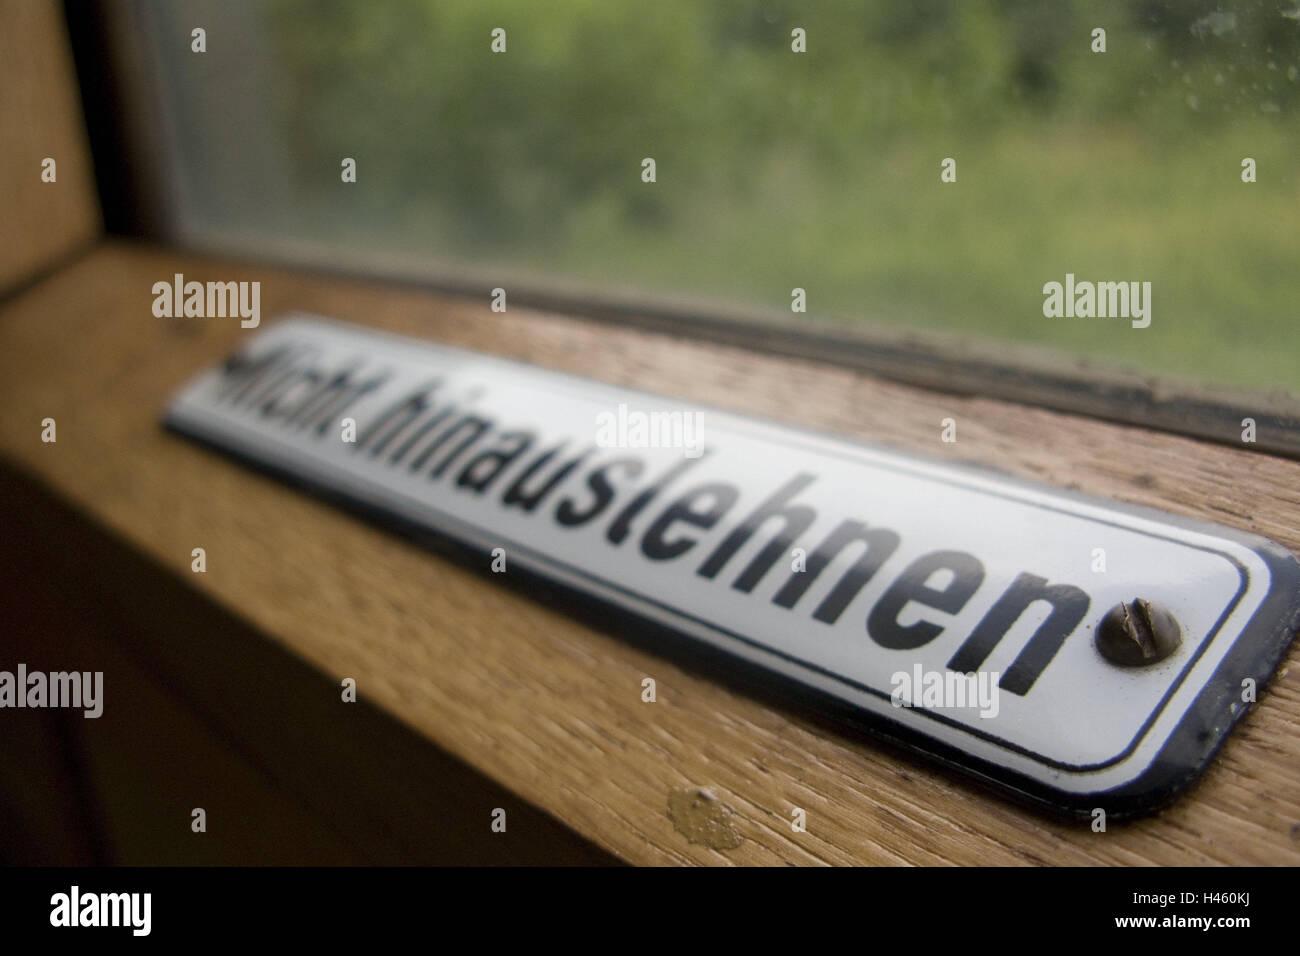 Nostalgia train, sign 'Nicht hinauslehnen' (Do not lean out), detail, - Stock Image